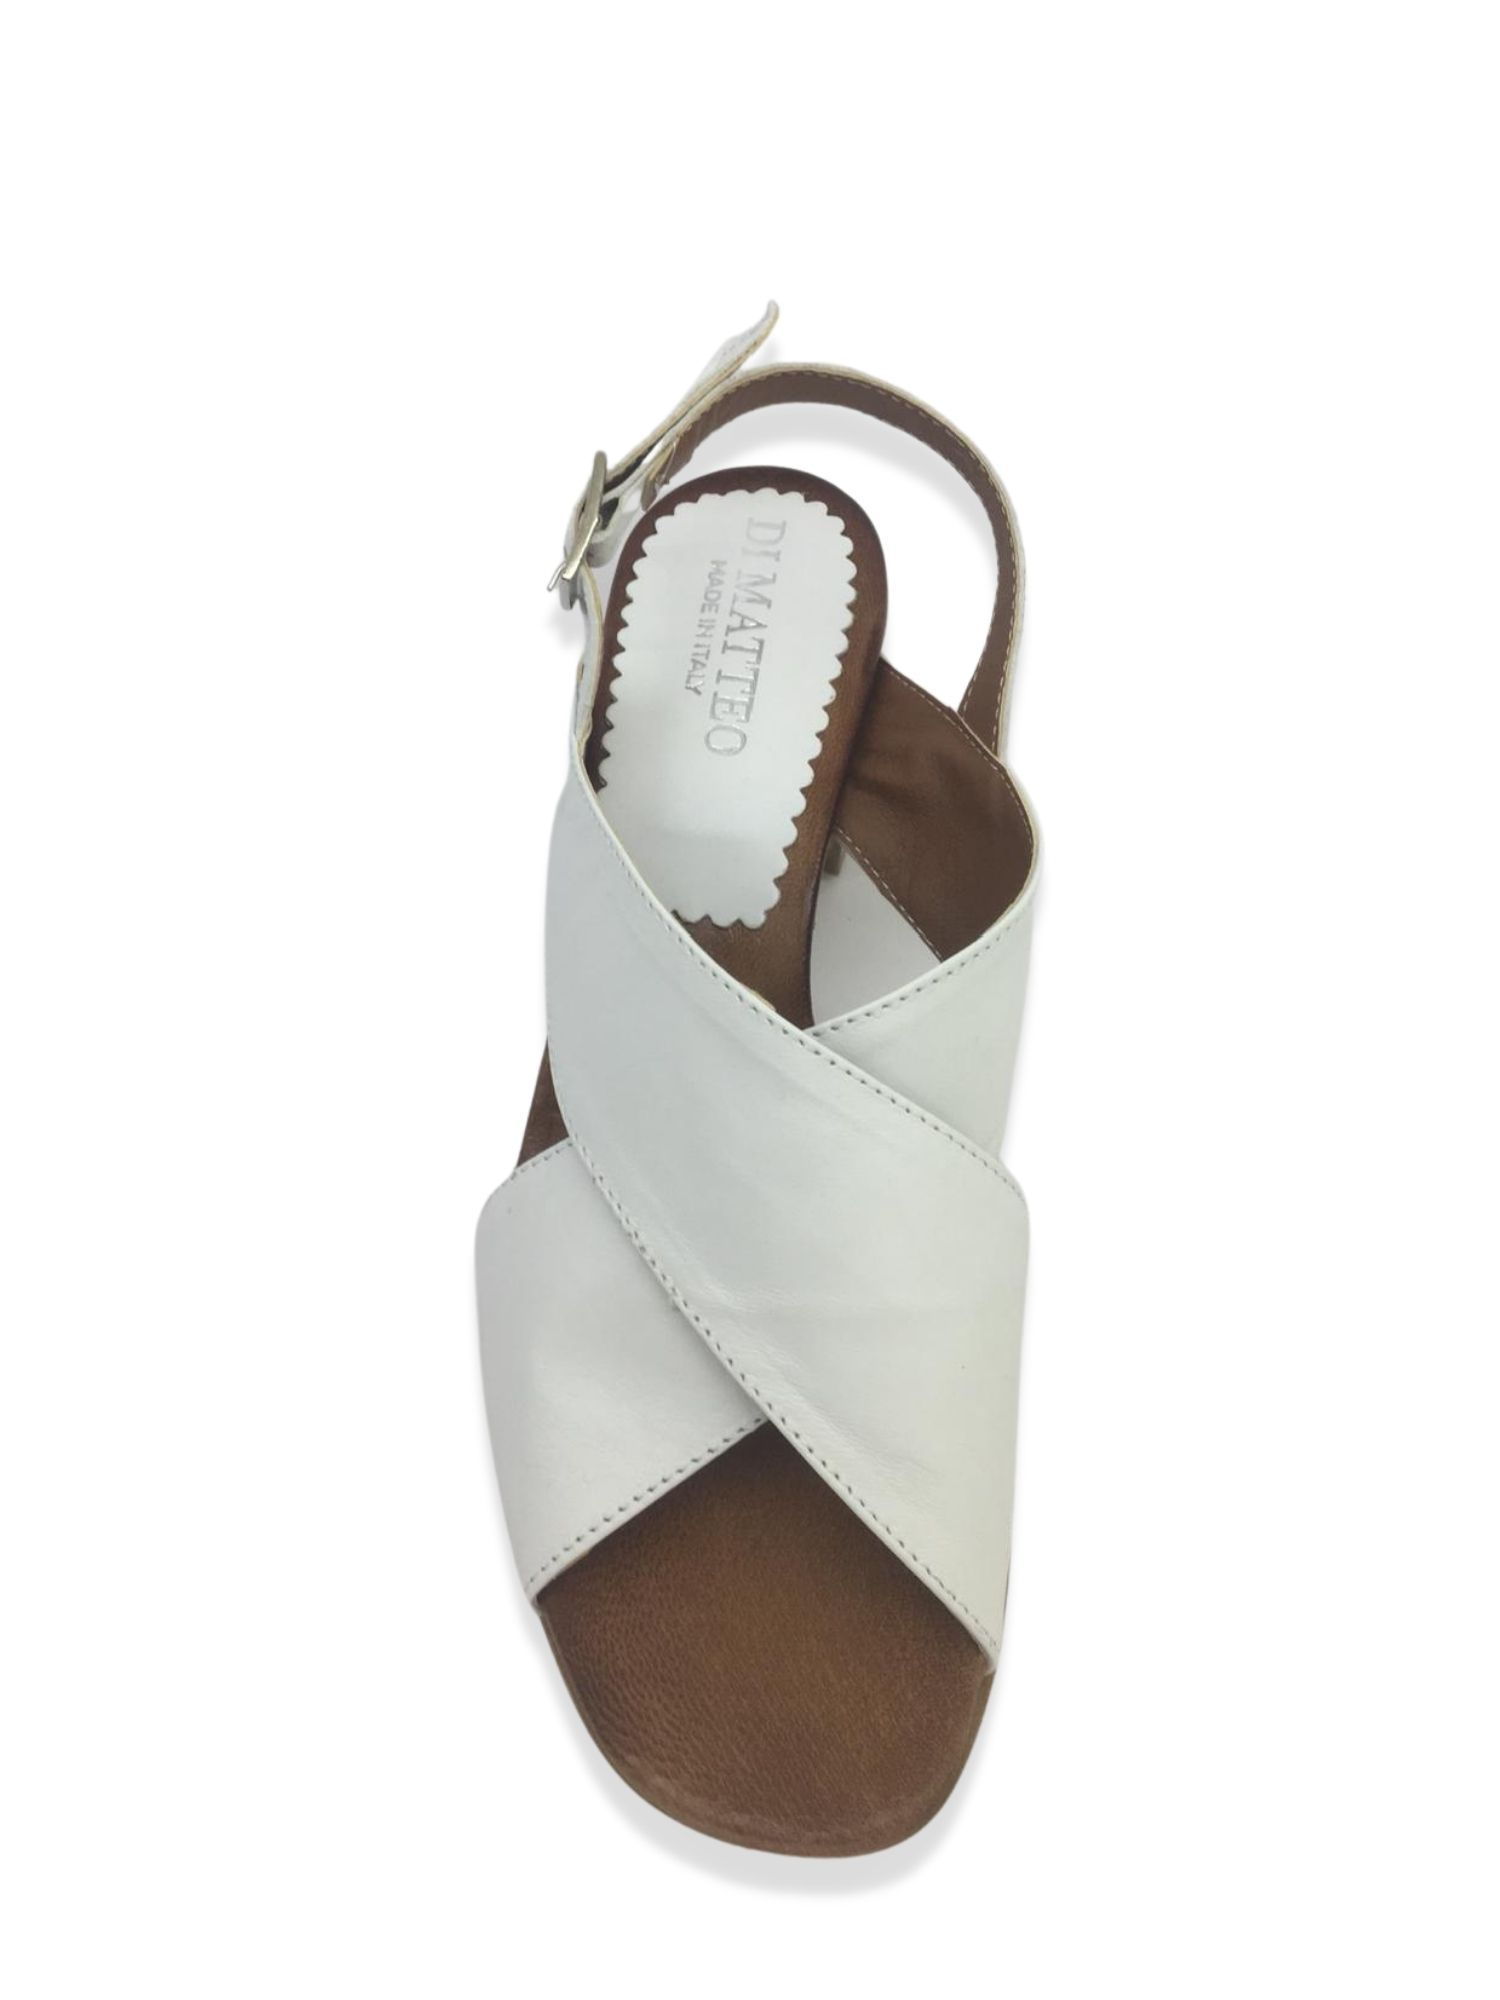 Sandalo Made in Italy 505 Bianco alto 1